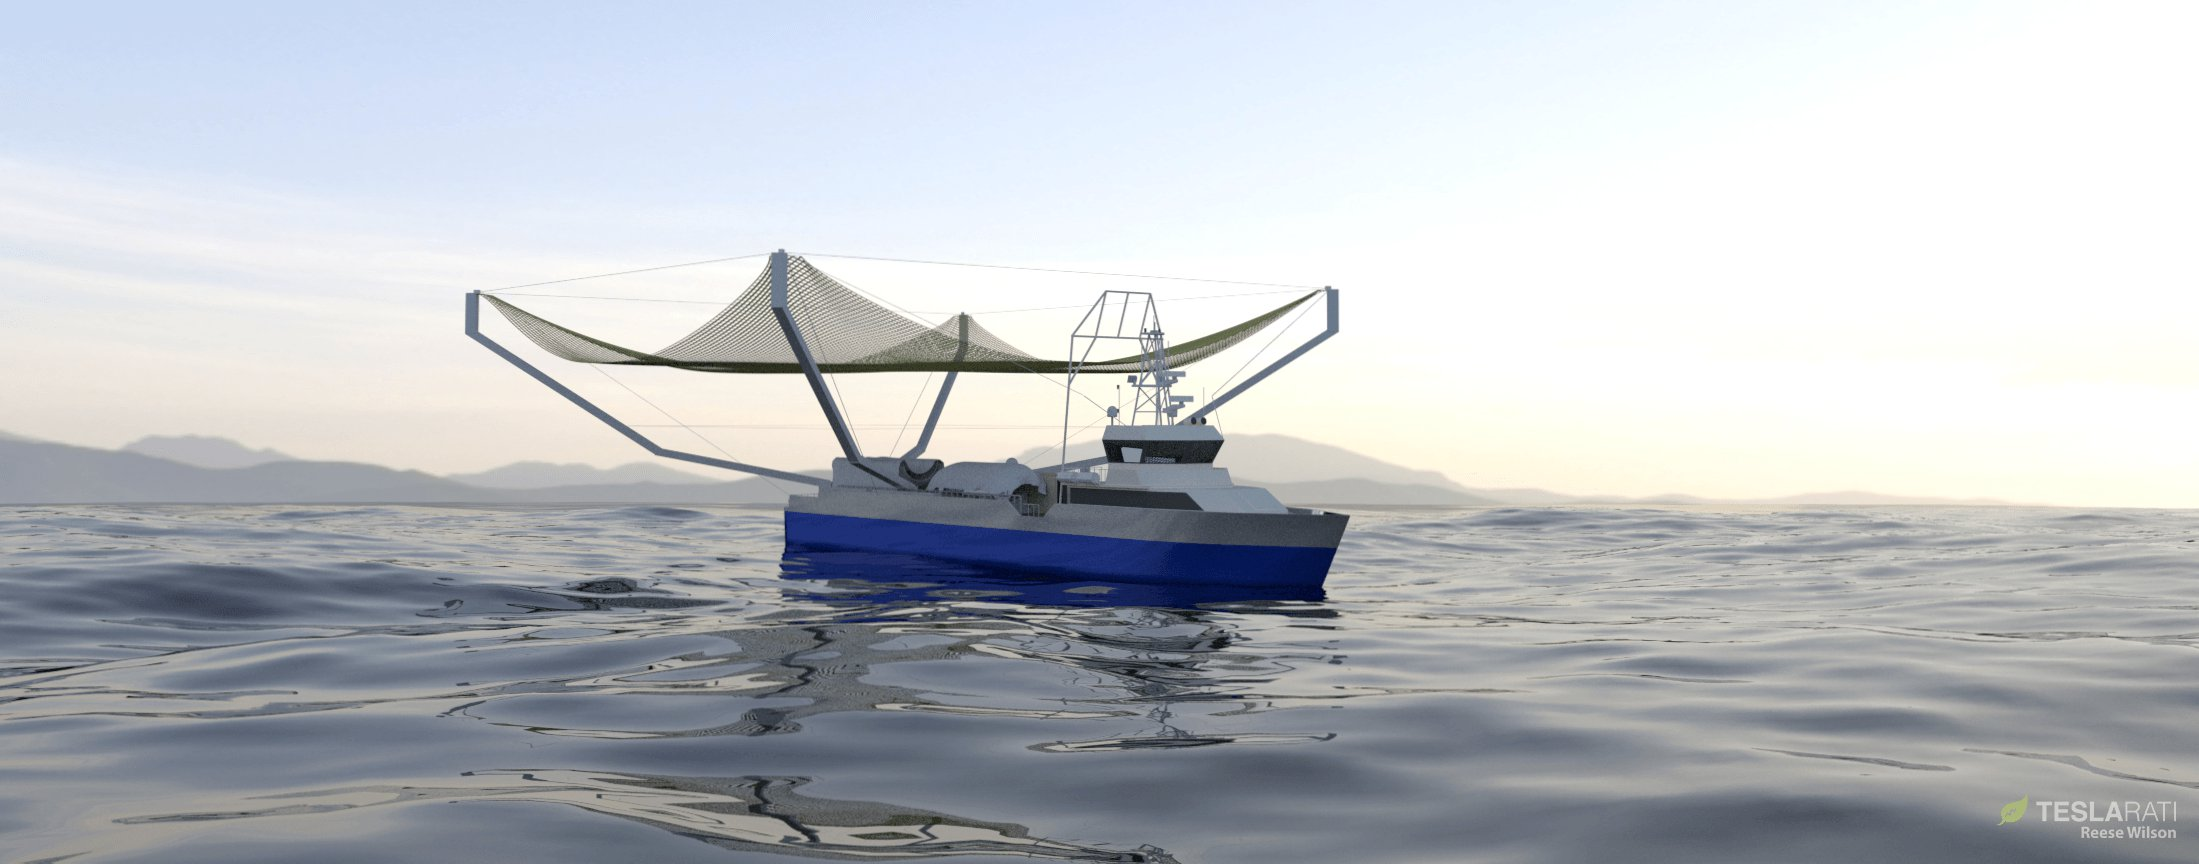 Mr Steven 4X net concept ocean (Reese Wilson) 1